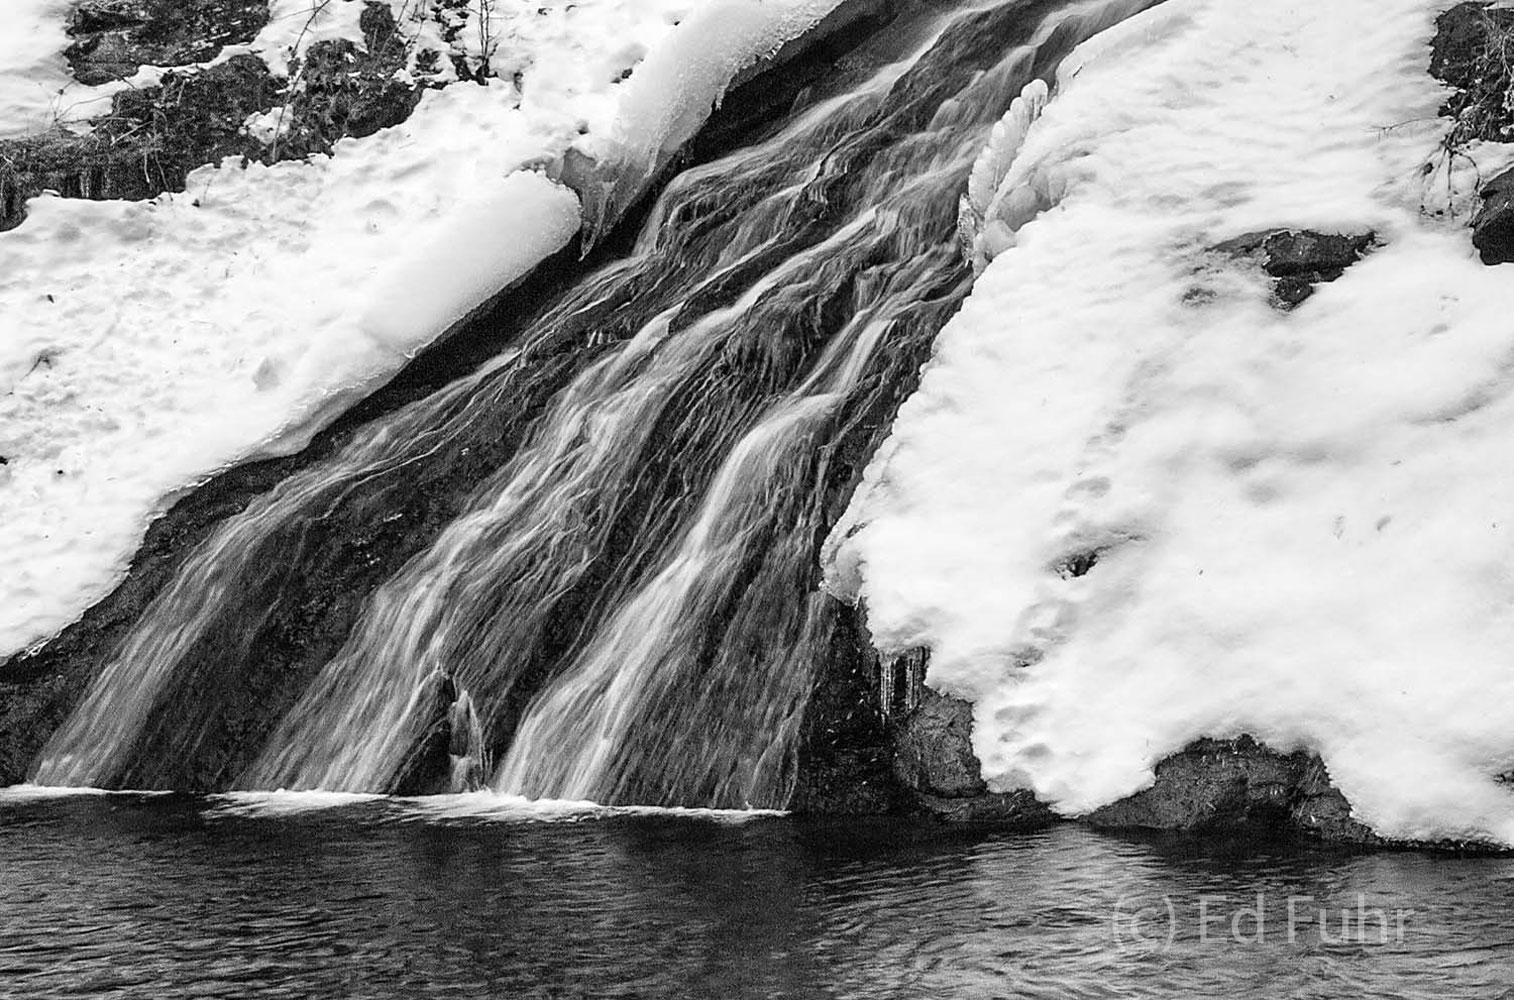 Shenandoah, Shenandoah National Park, photo, photography, images, mountains, wilderness, Virginia, waterfall, Skyline Drive, road, winter, snow, photo